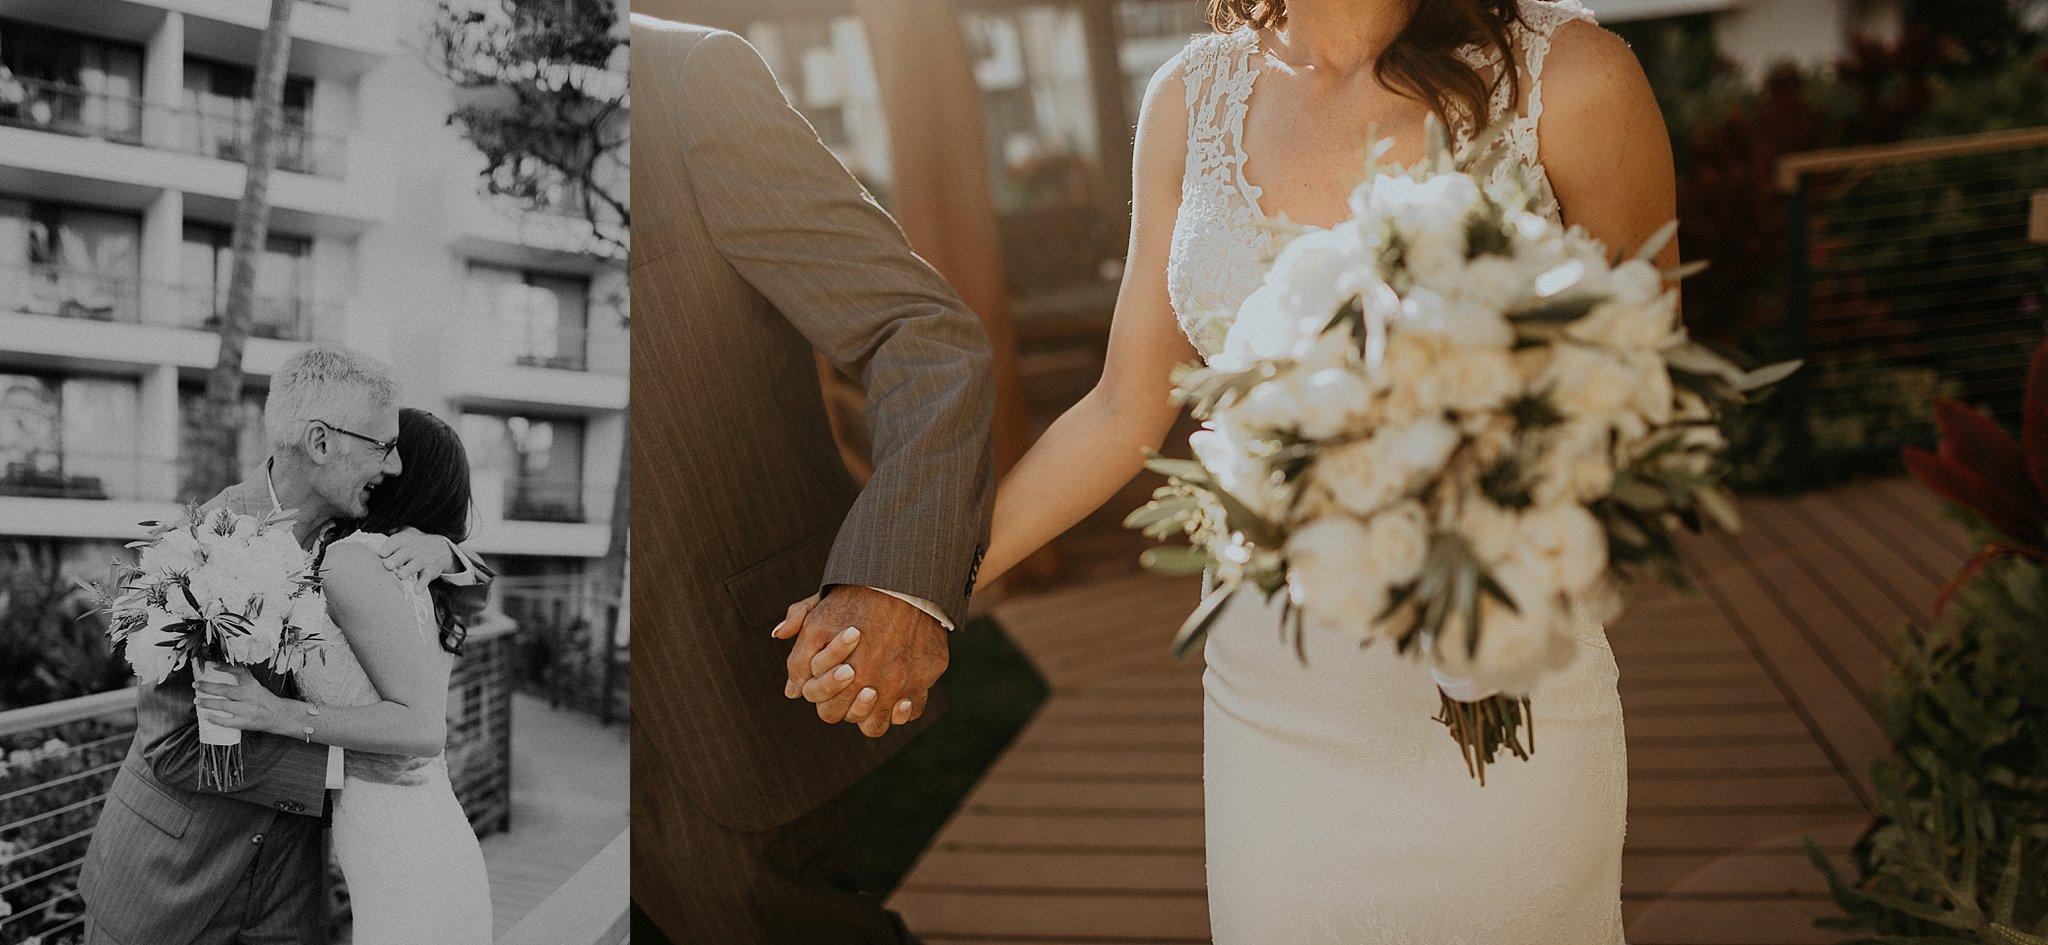 samantha_mcfarlen_bellingham_washington_engagement_photography_seattle_wedding_photographer_0195.jpg